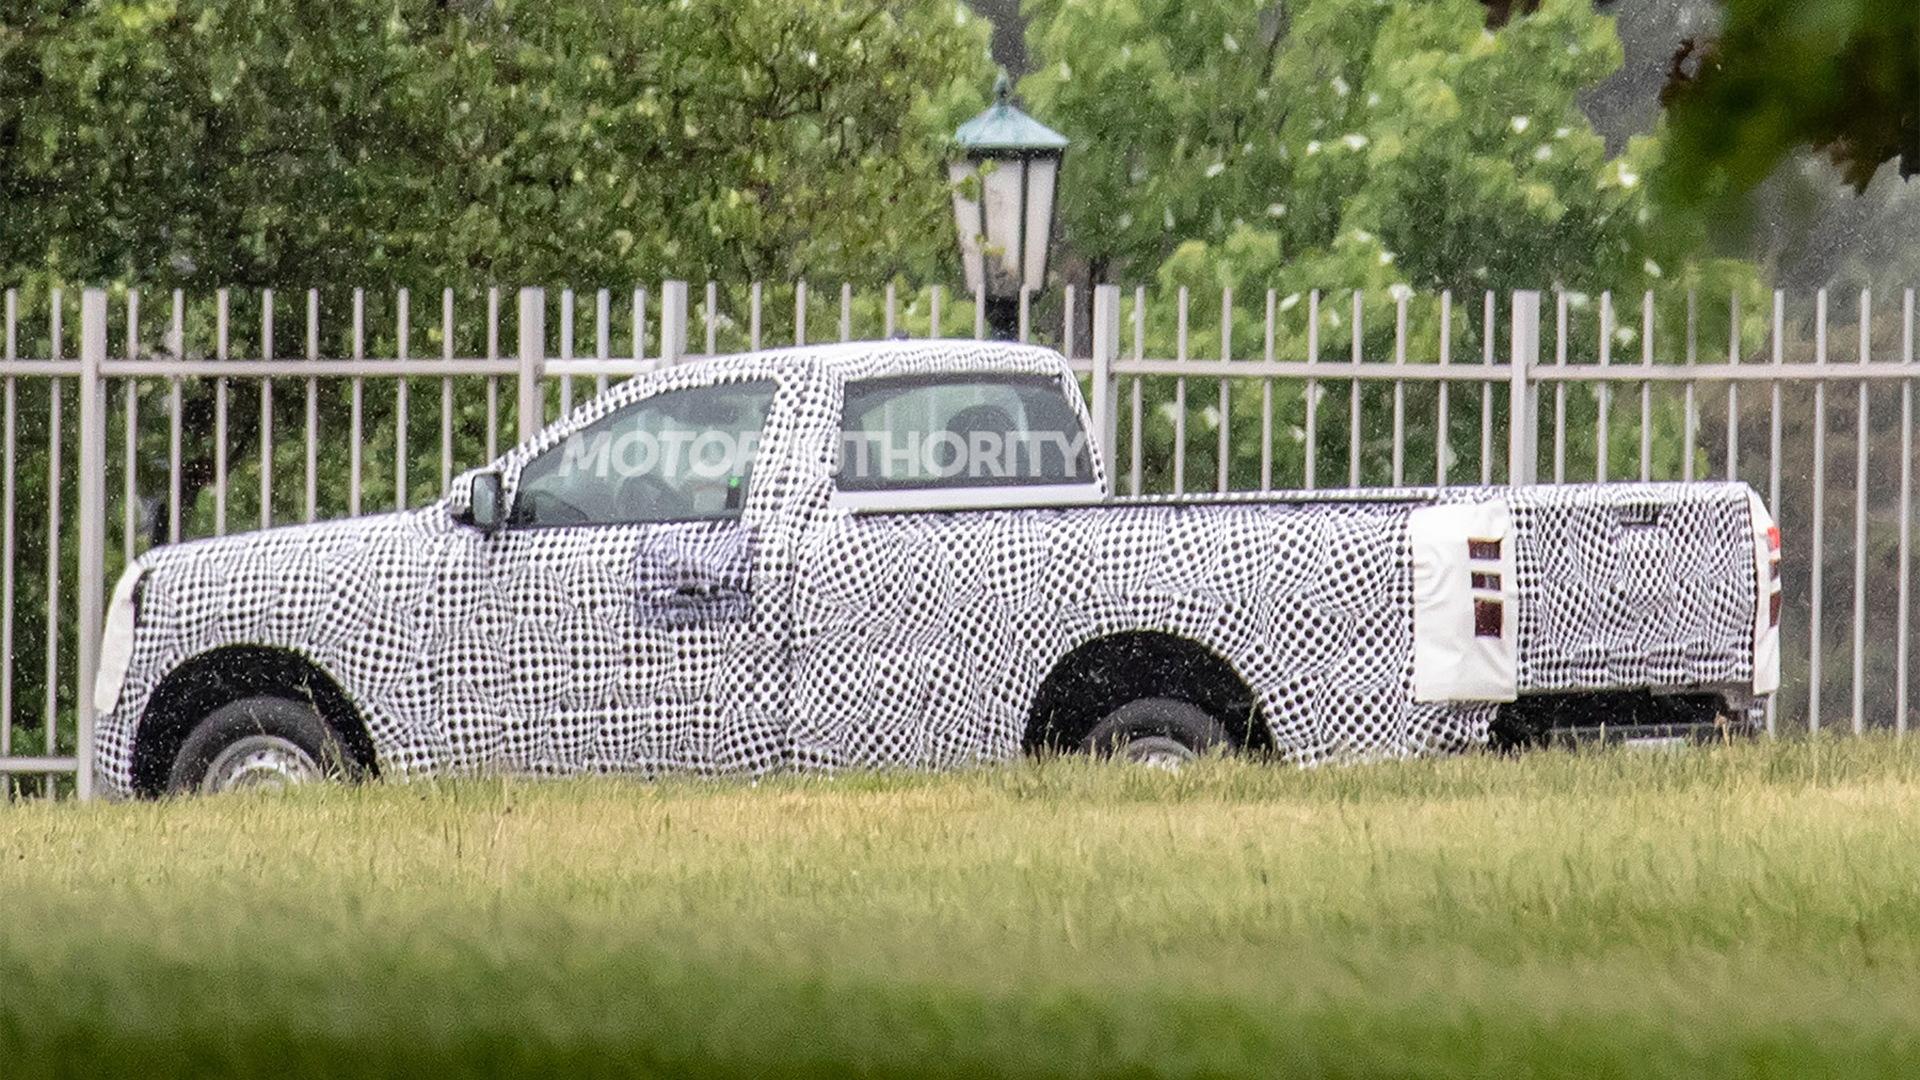 2022 Ford Ranger Single Cab spy shots - Photo credit: S. Baldauf/SB-Medien